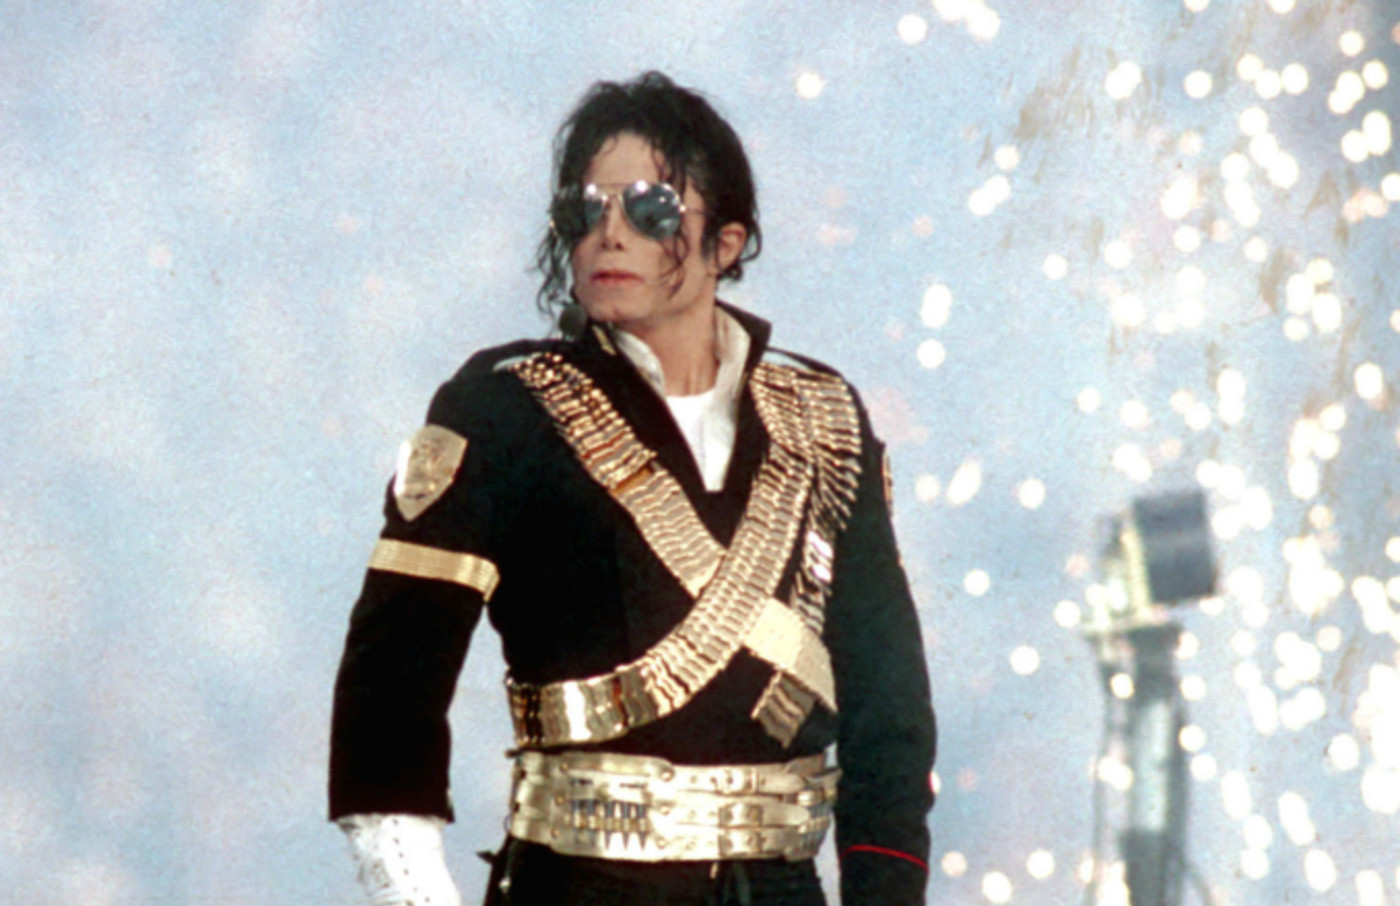 Michael Jackson performs